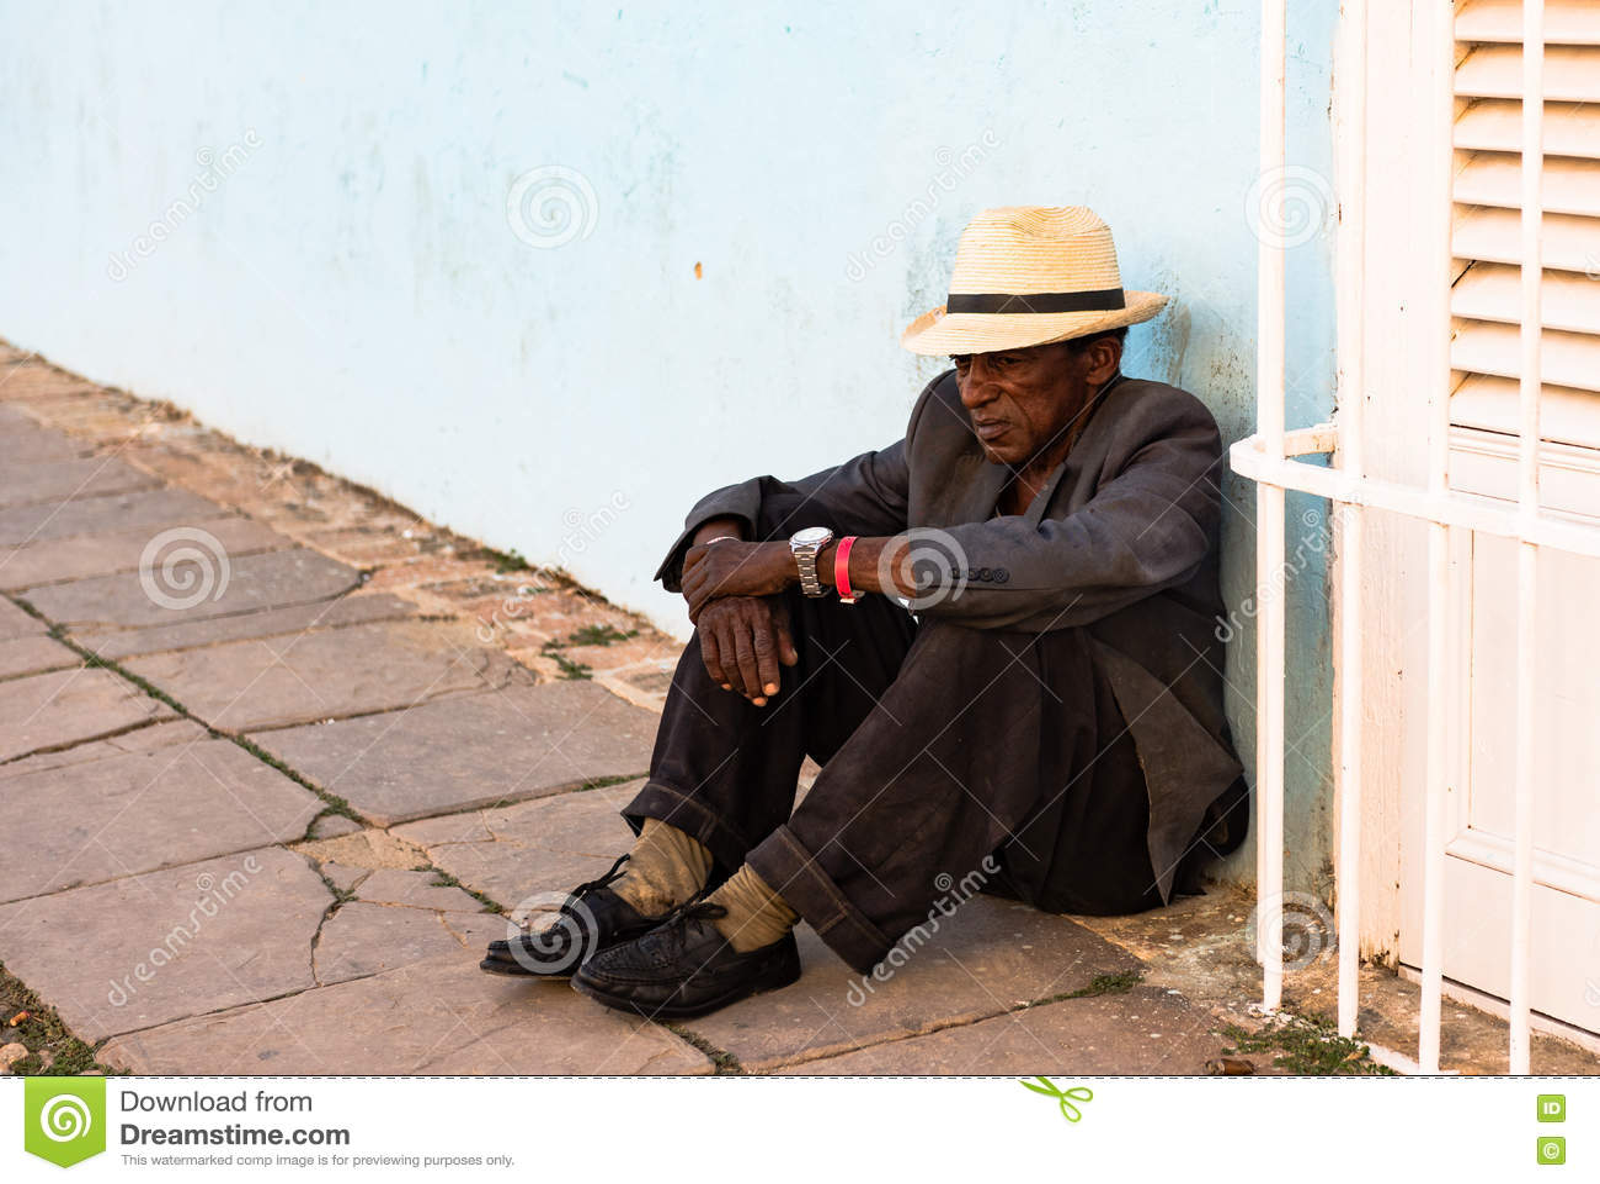 Poverty In Cuba - Trinidad bf79f9e5b32d